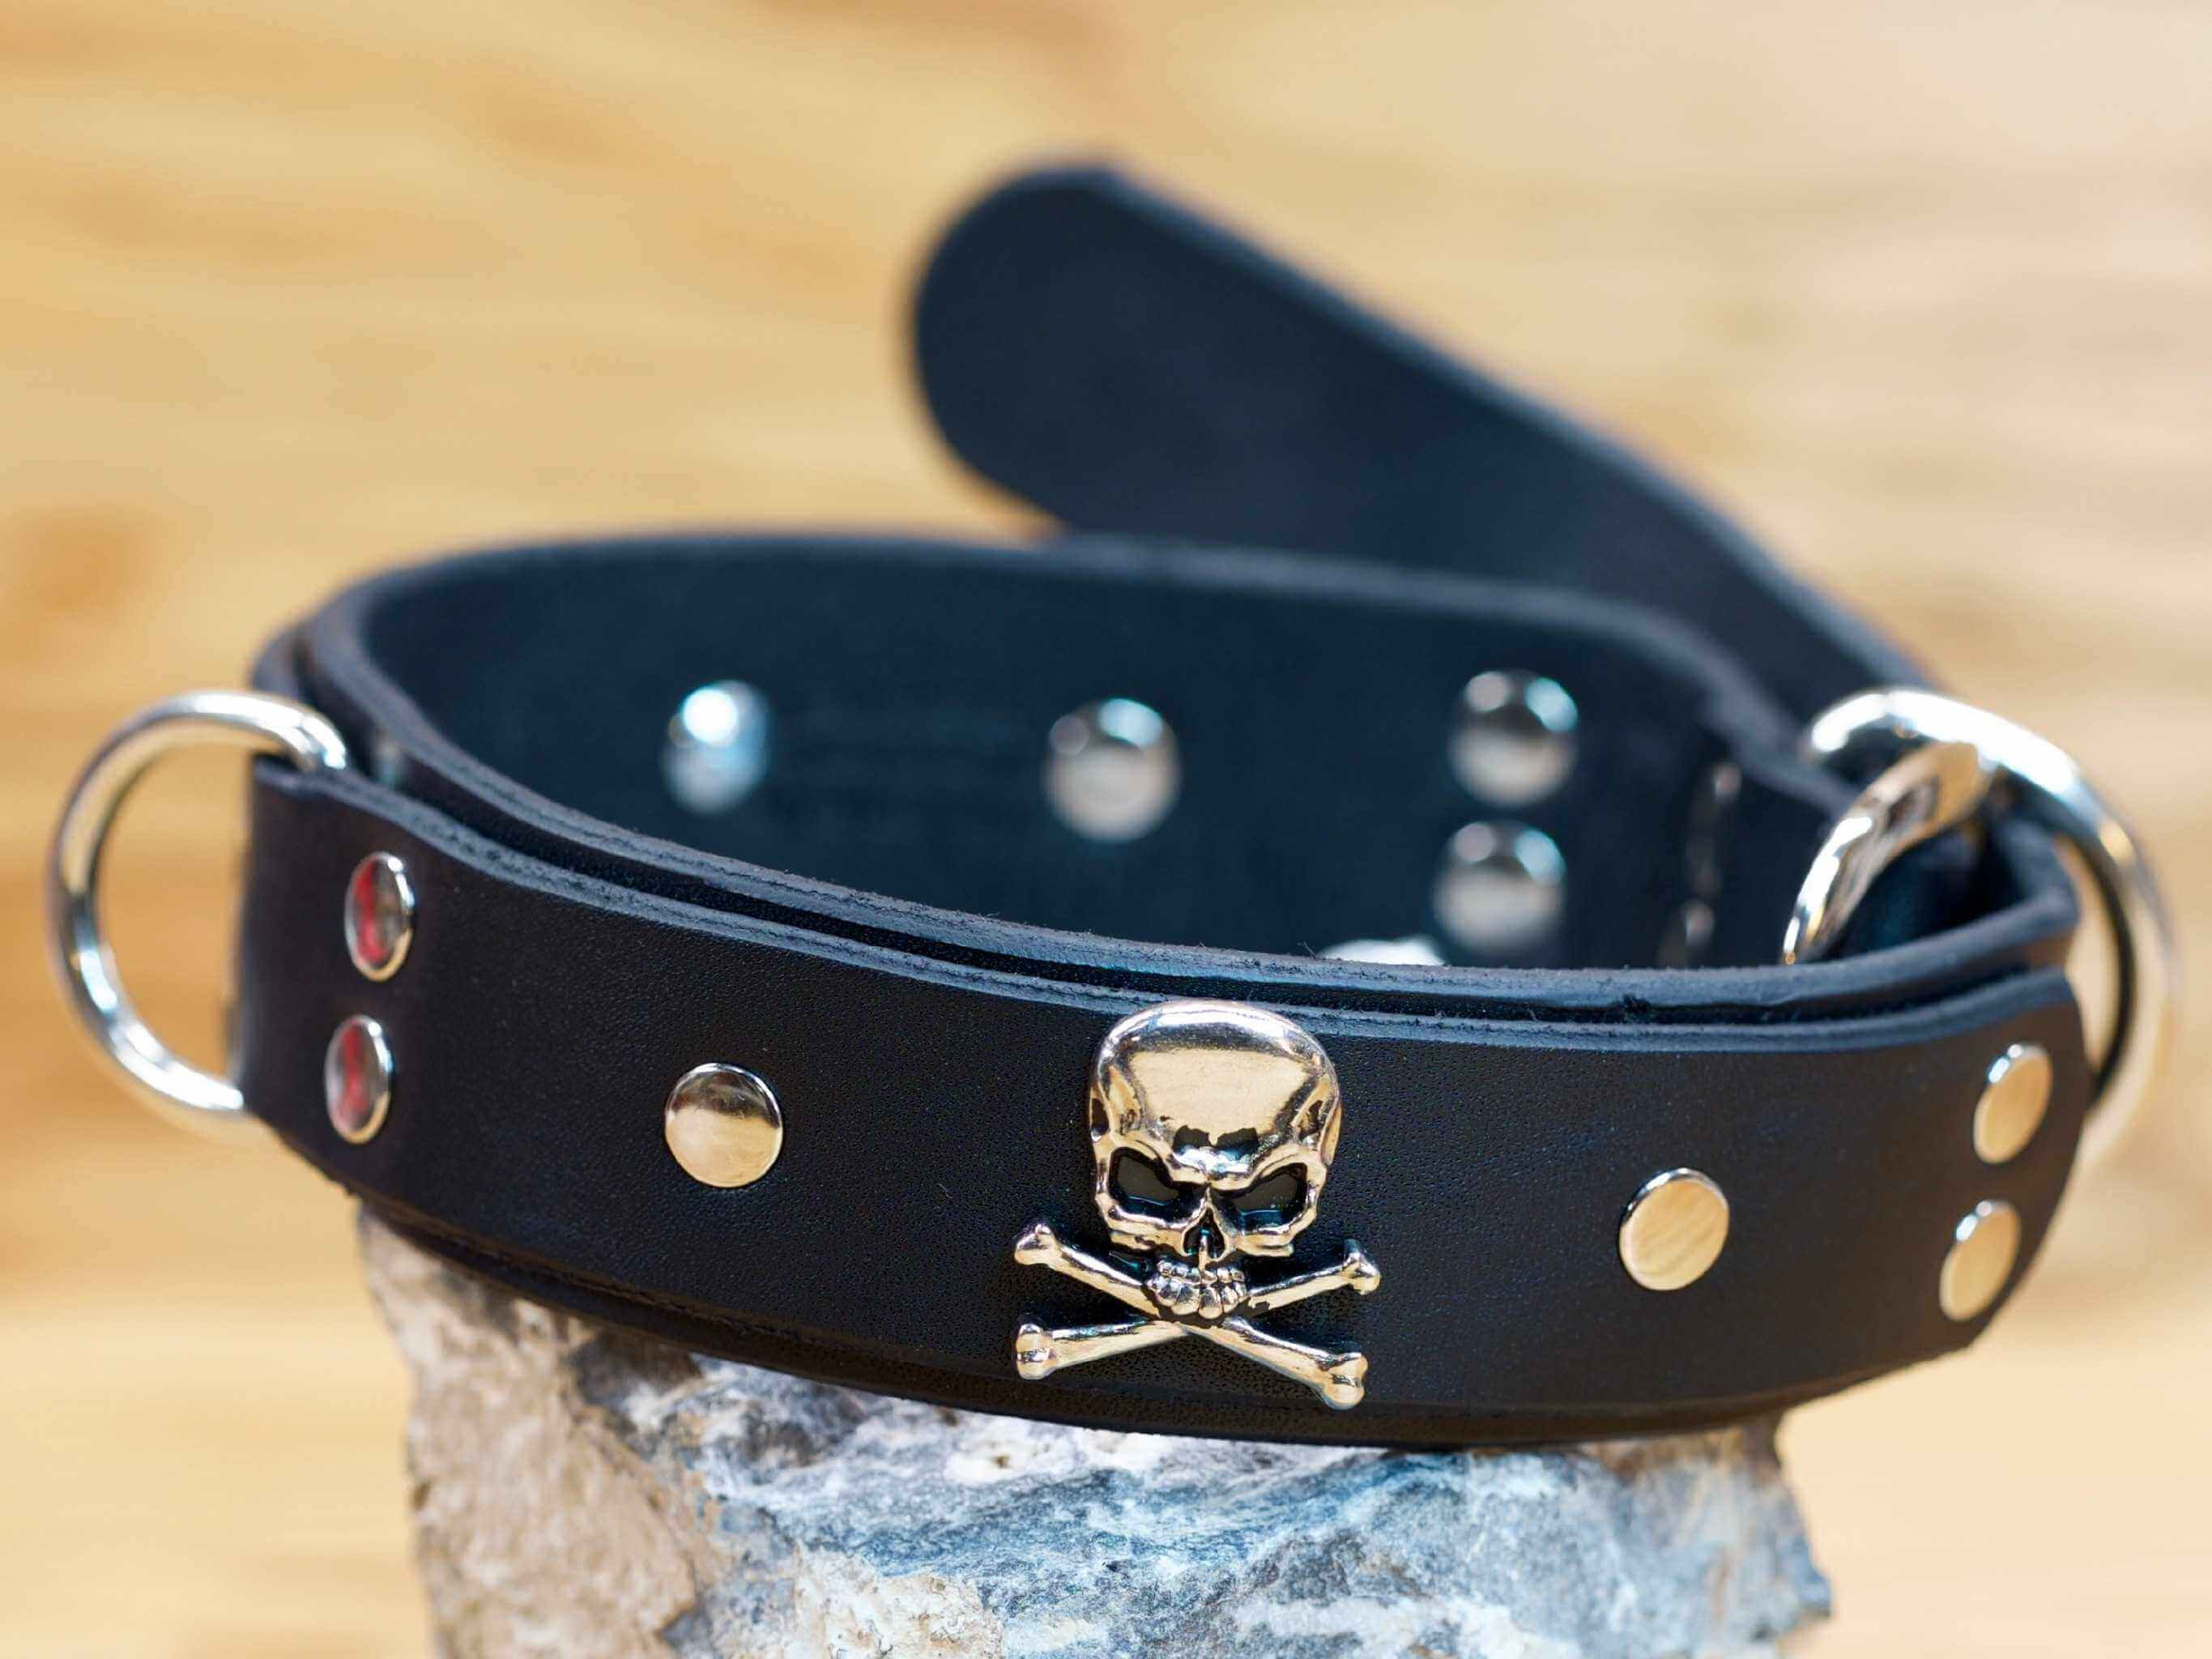 Skulls & Bones double-layer leather dog collar